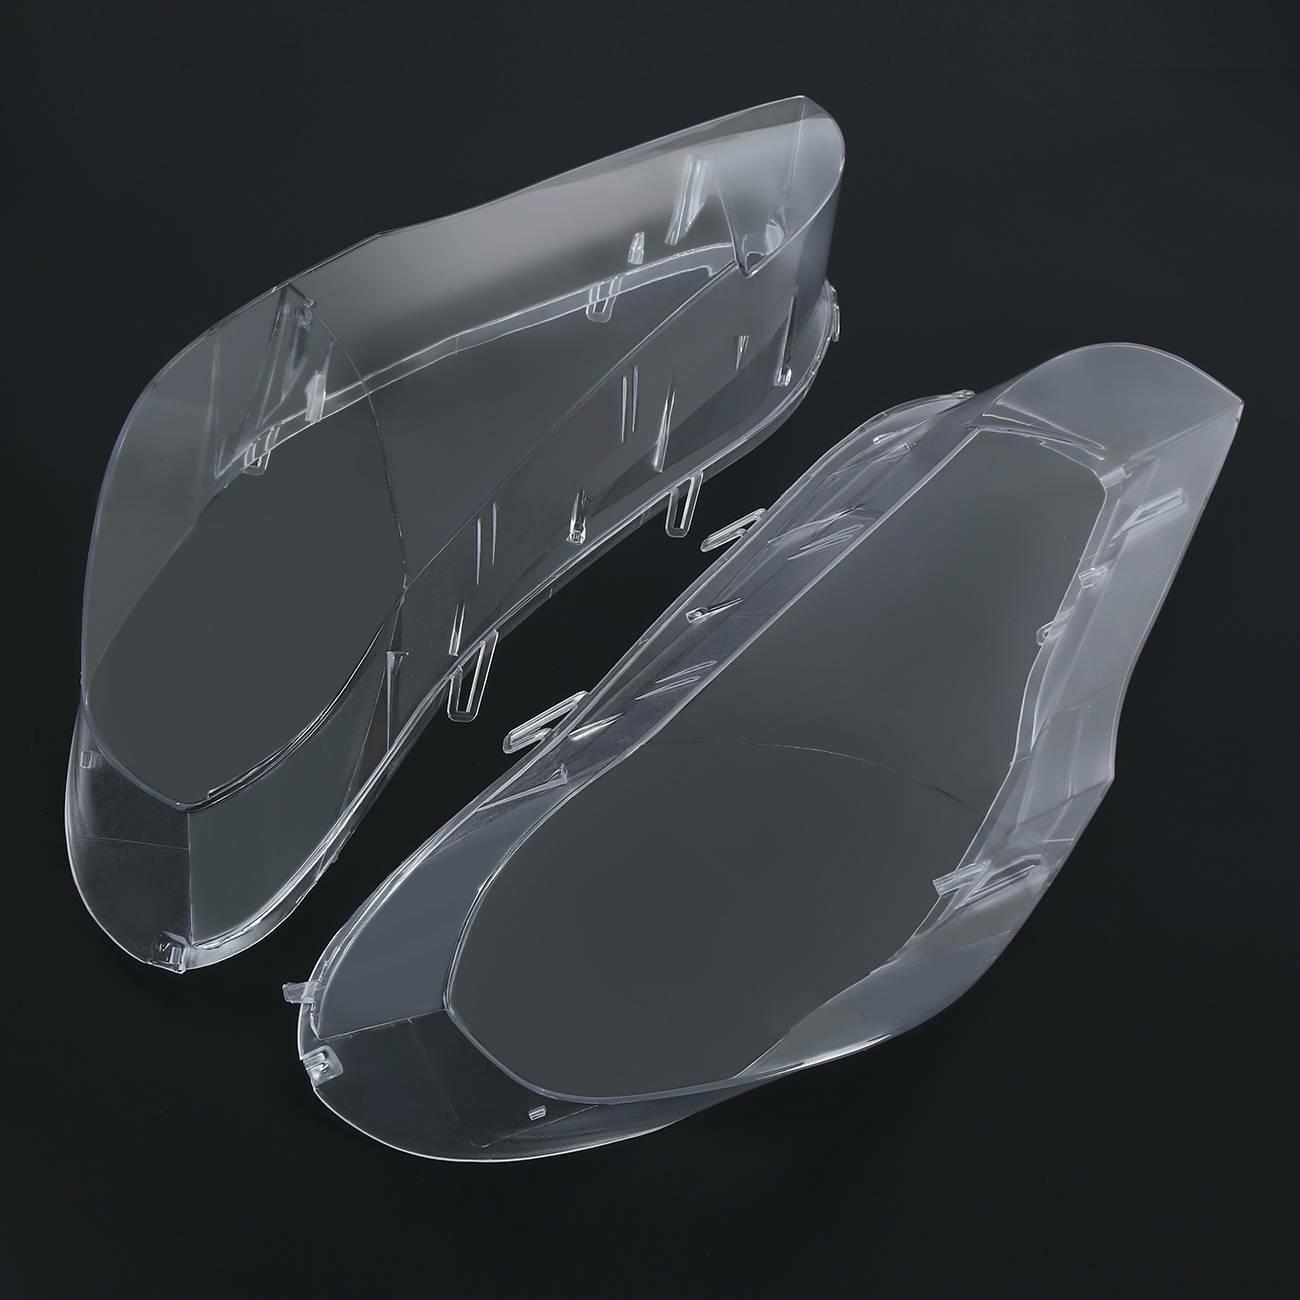 Samger 2Pcs Headlamp Lens Cover Car Headlight Lens for BMW 5 Series E70 2007-2013 Left + Right